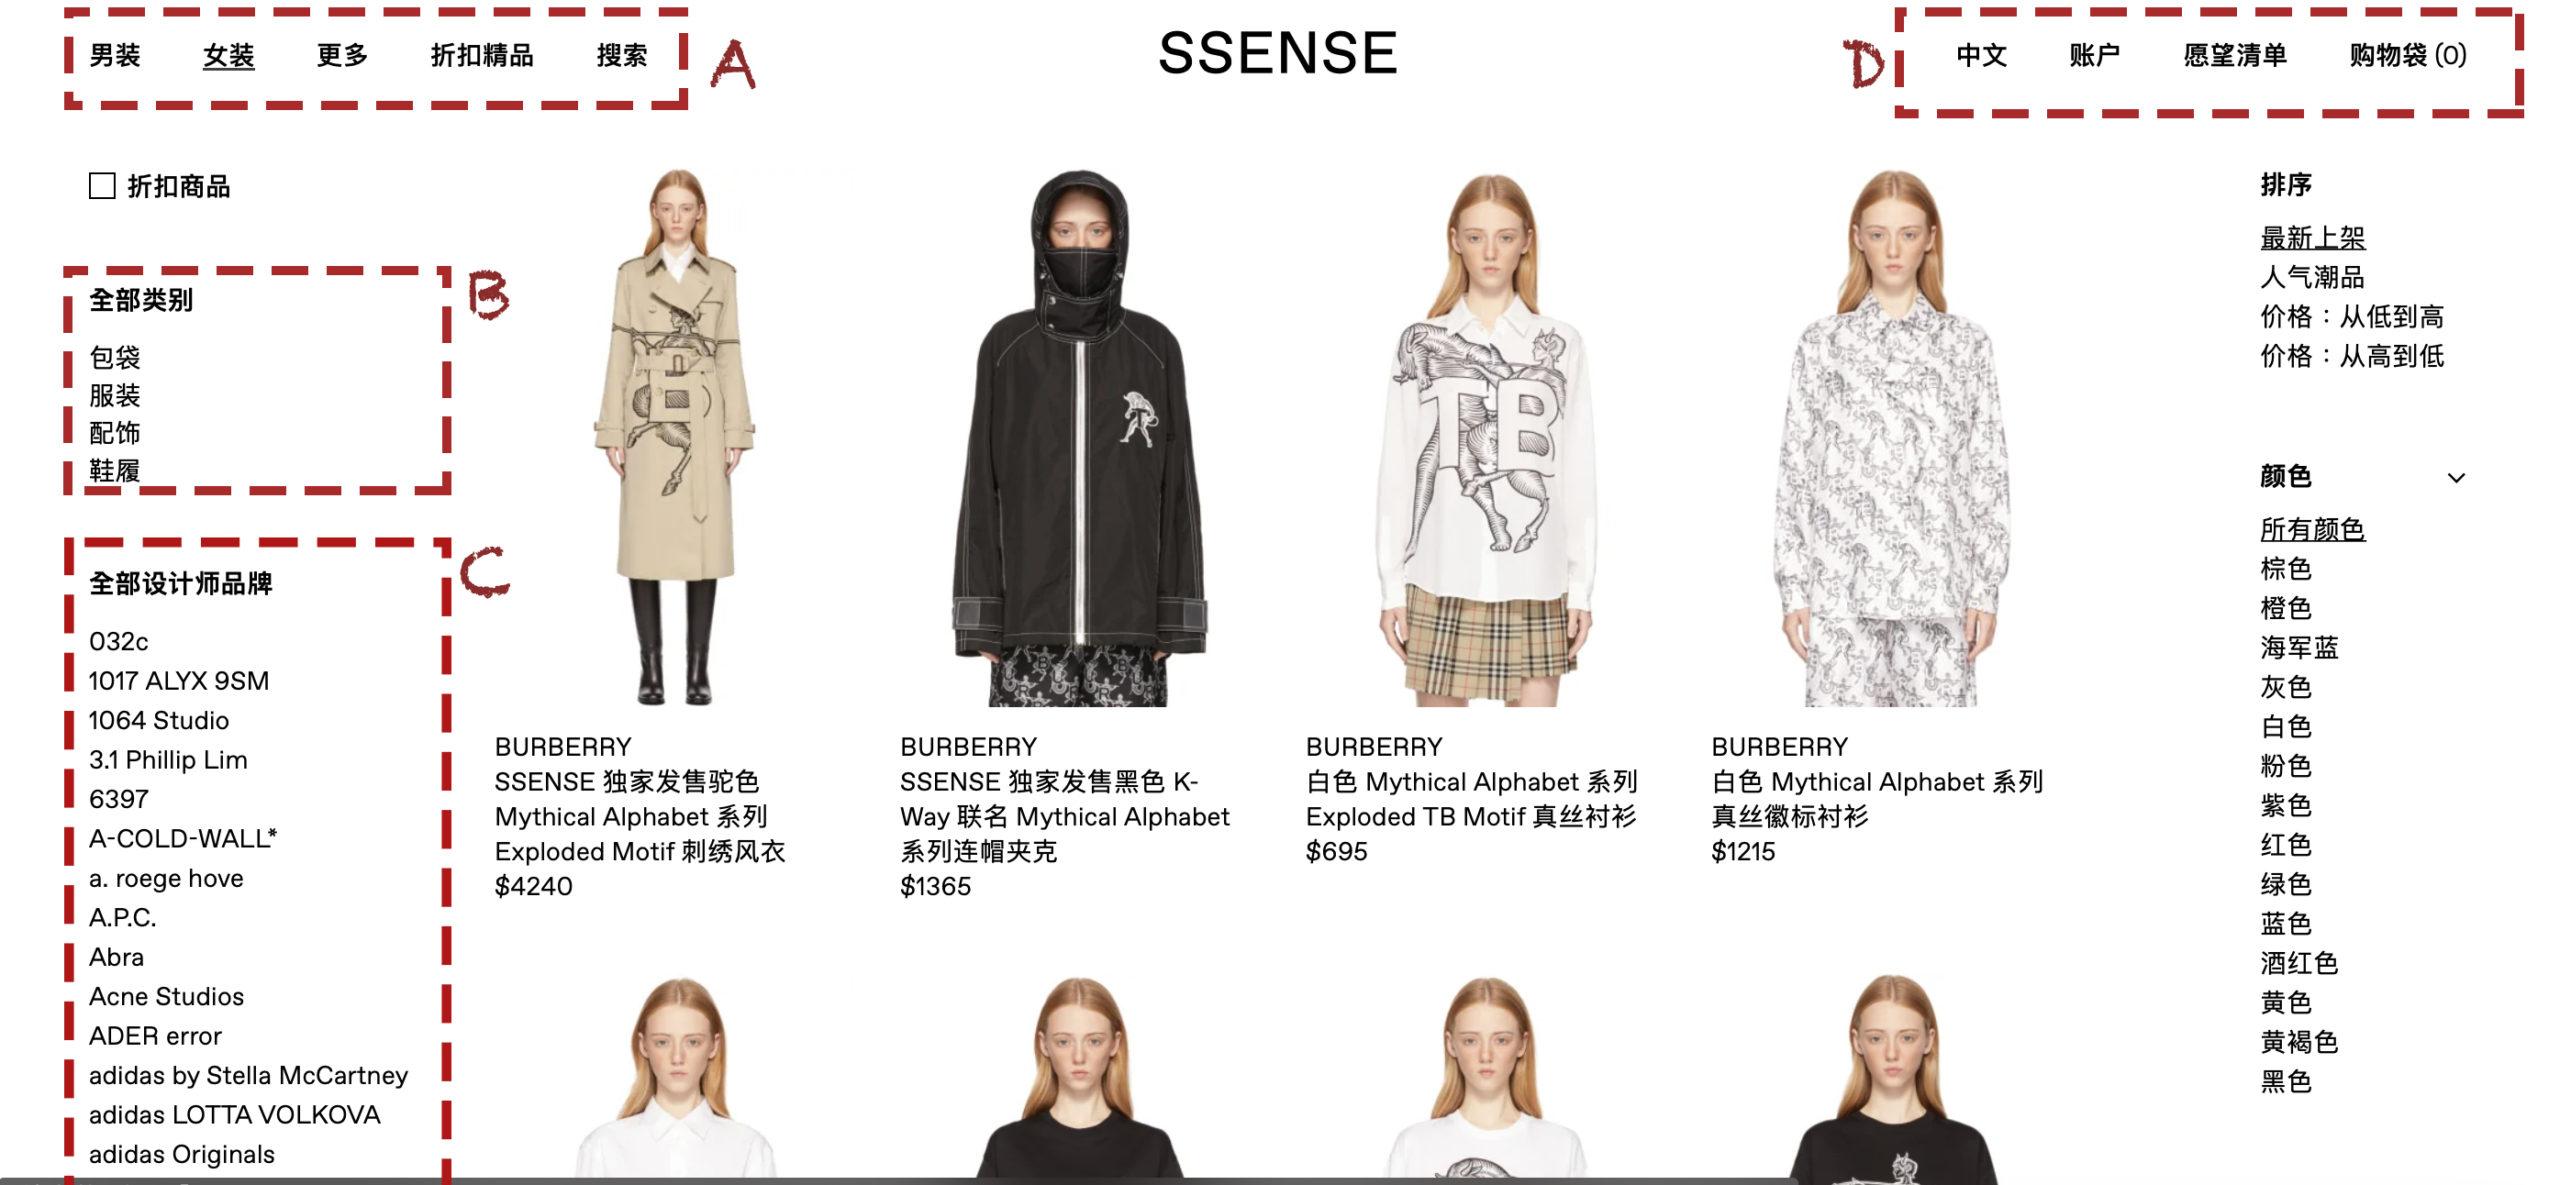 SSENSE 購物教學 網站介紹